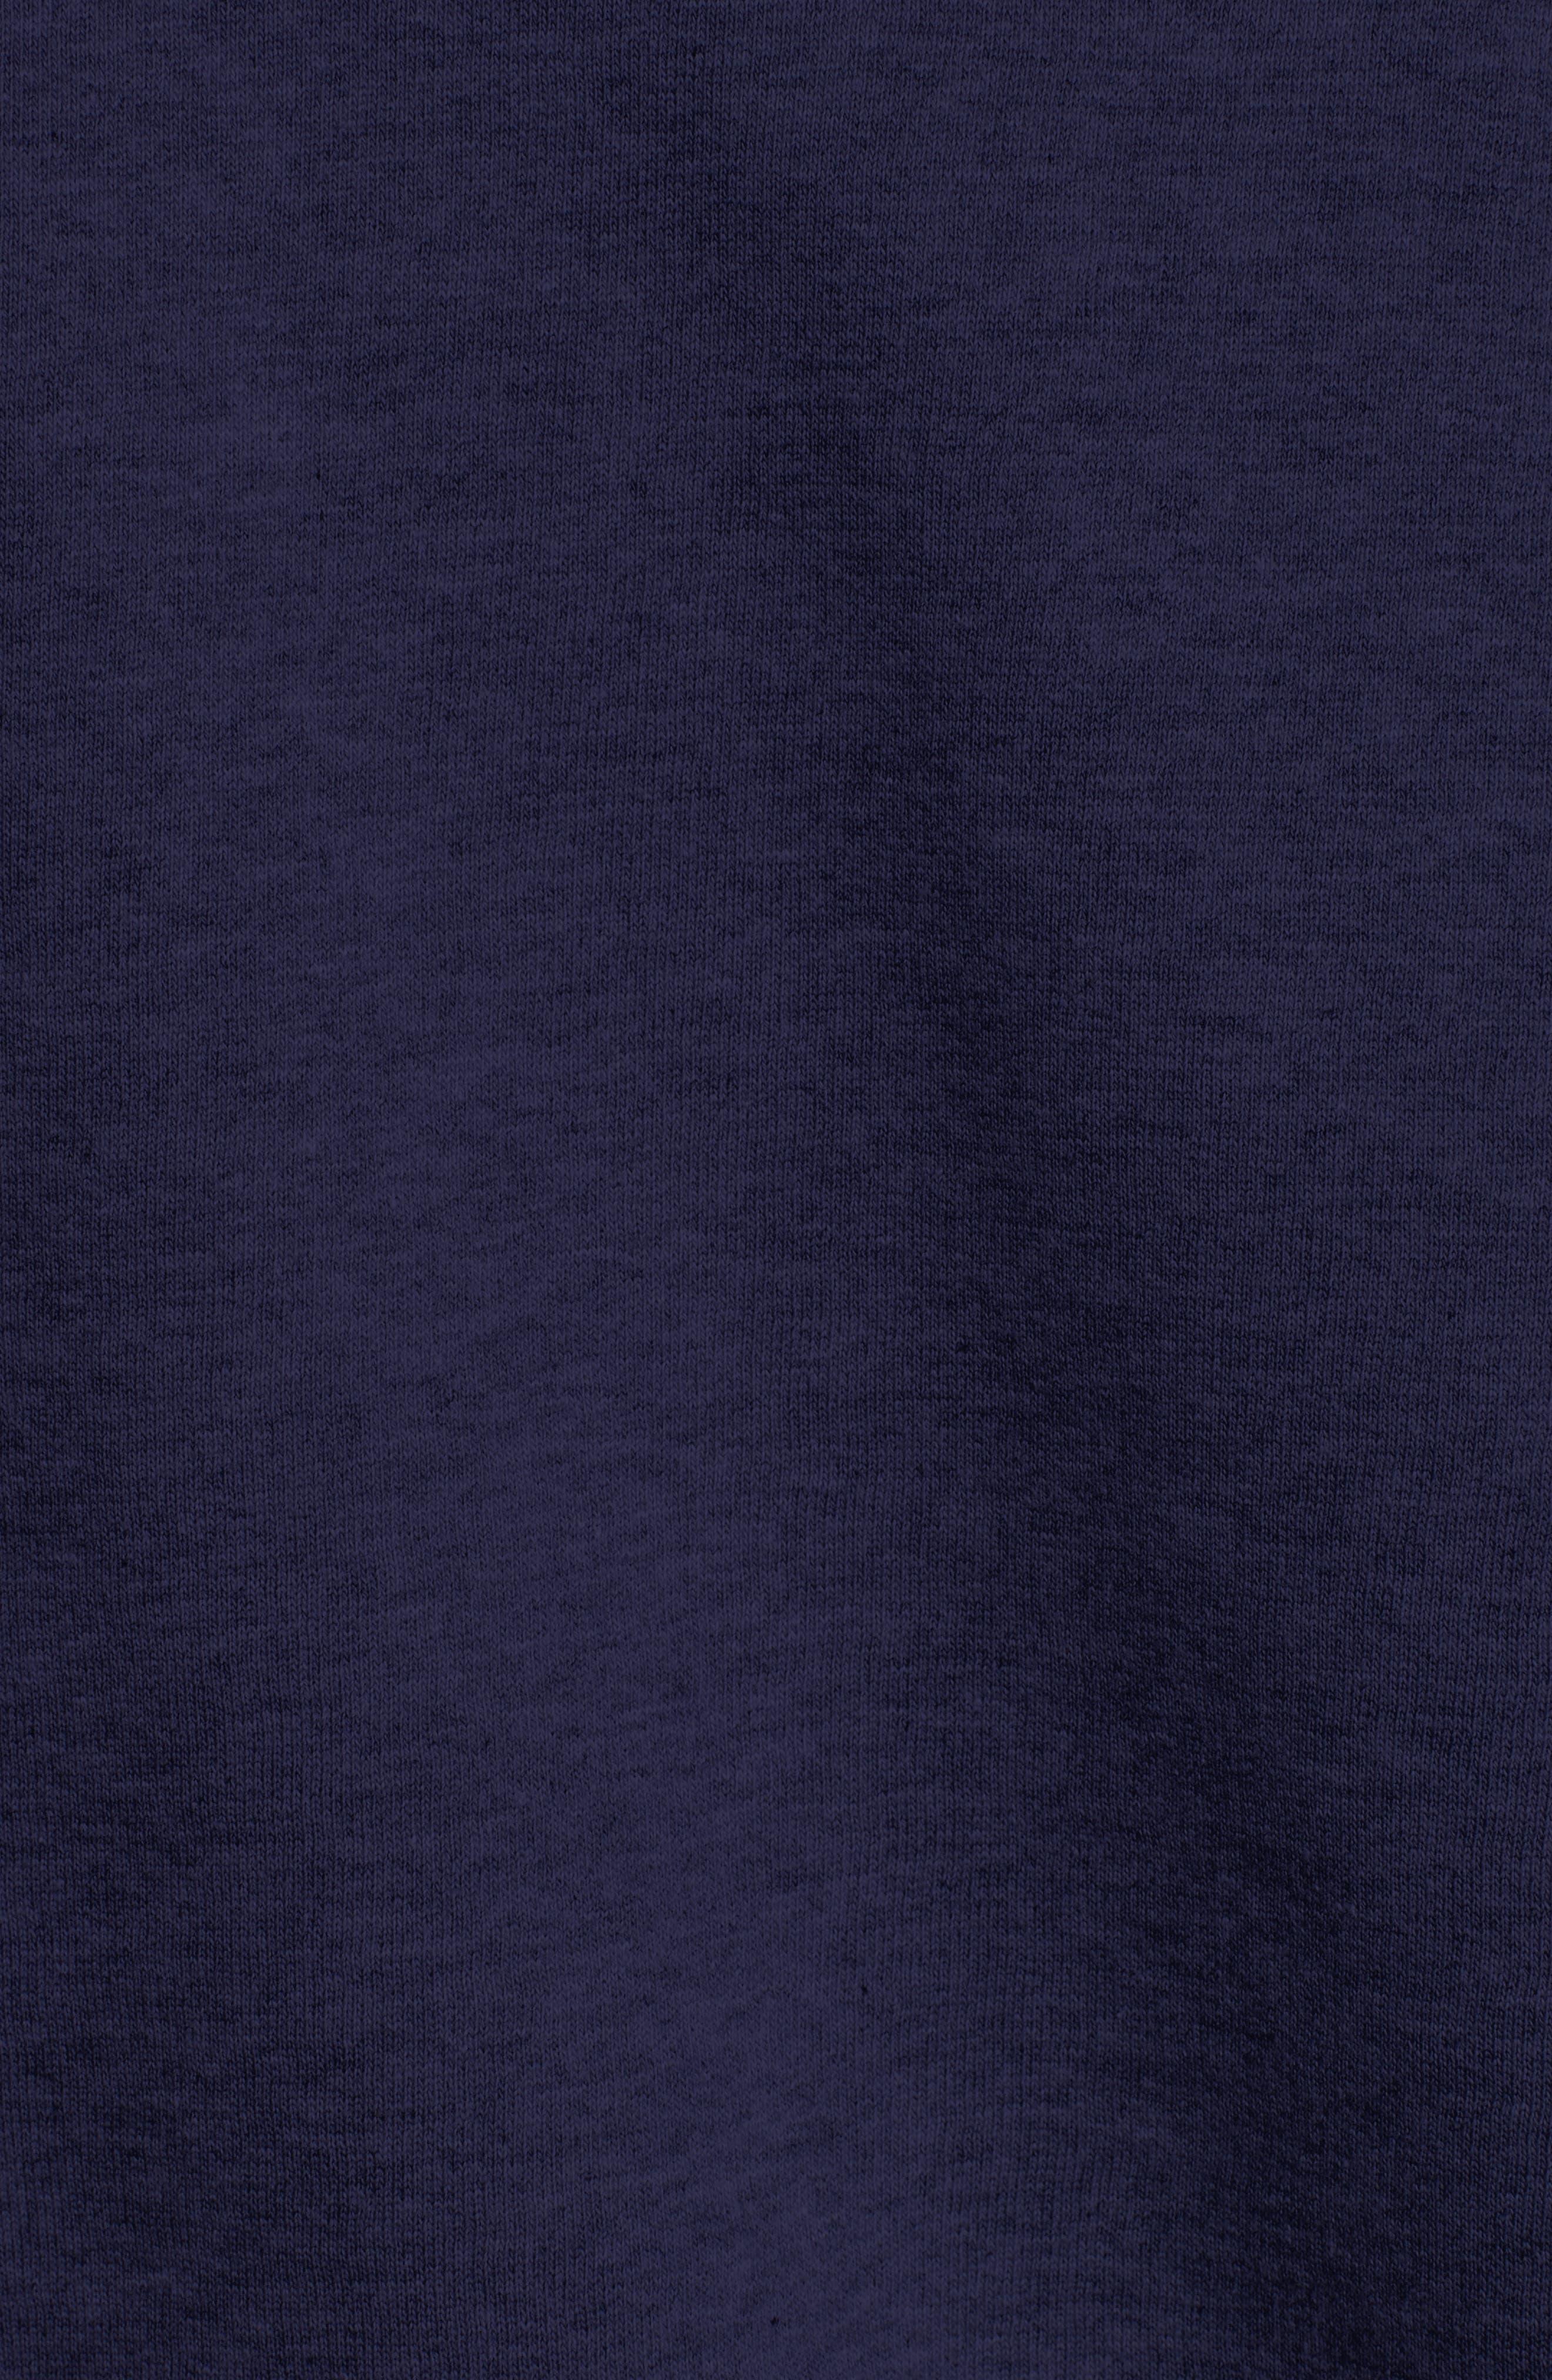 Alternate Image 3  - Burberry Torto Embroidered Sweatshirt